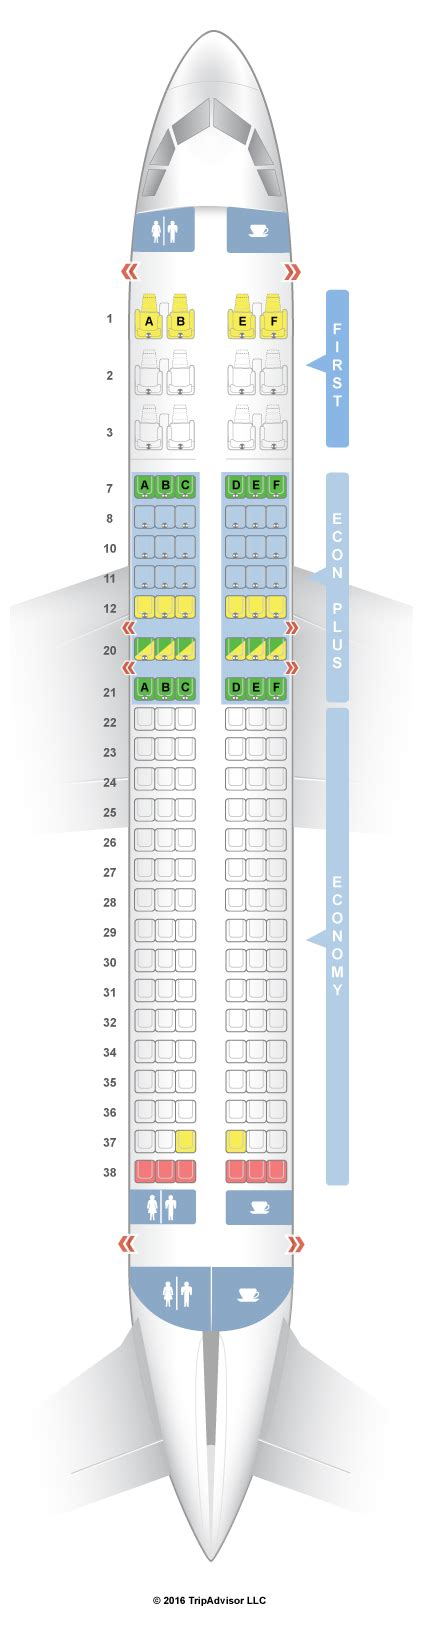 airbus a320 seating seatguru seat map united airbus a320 320